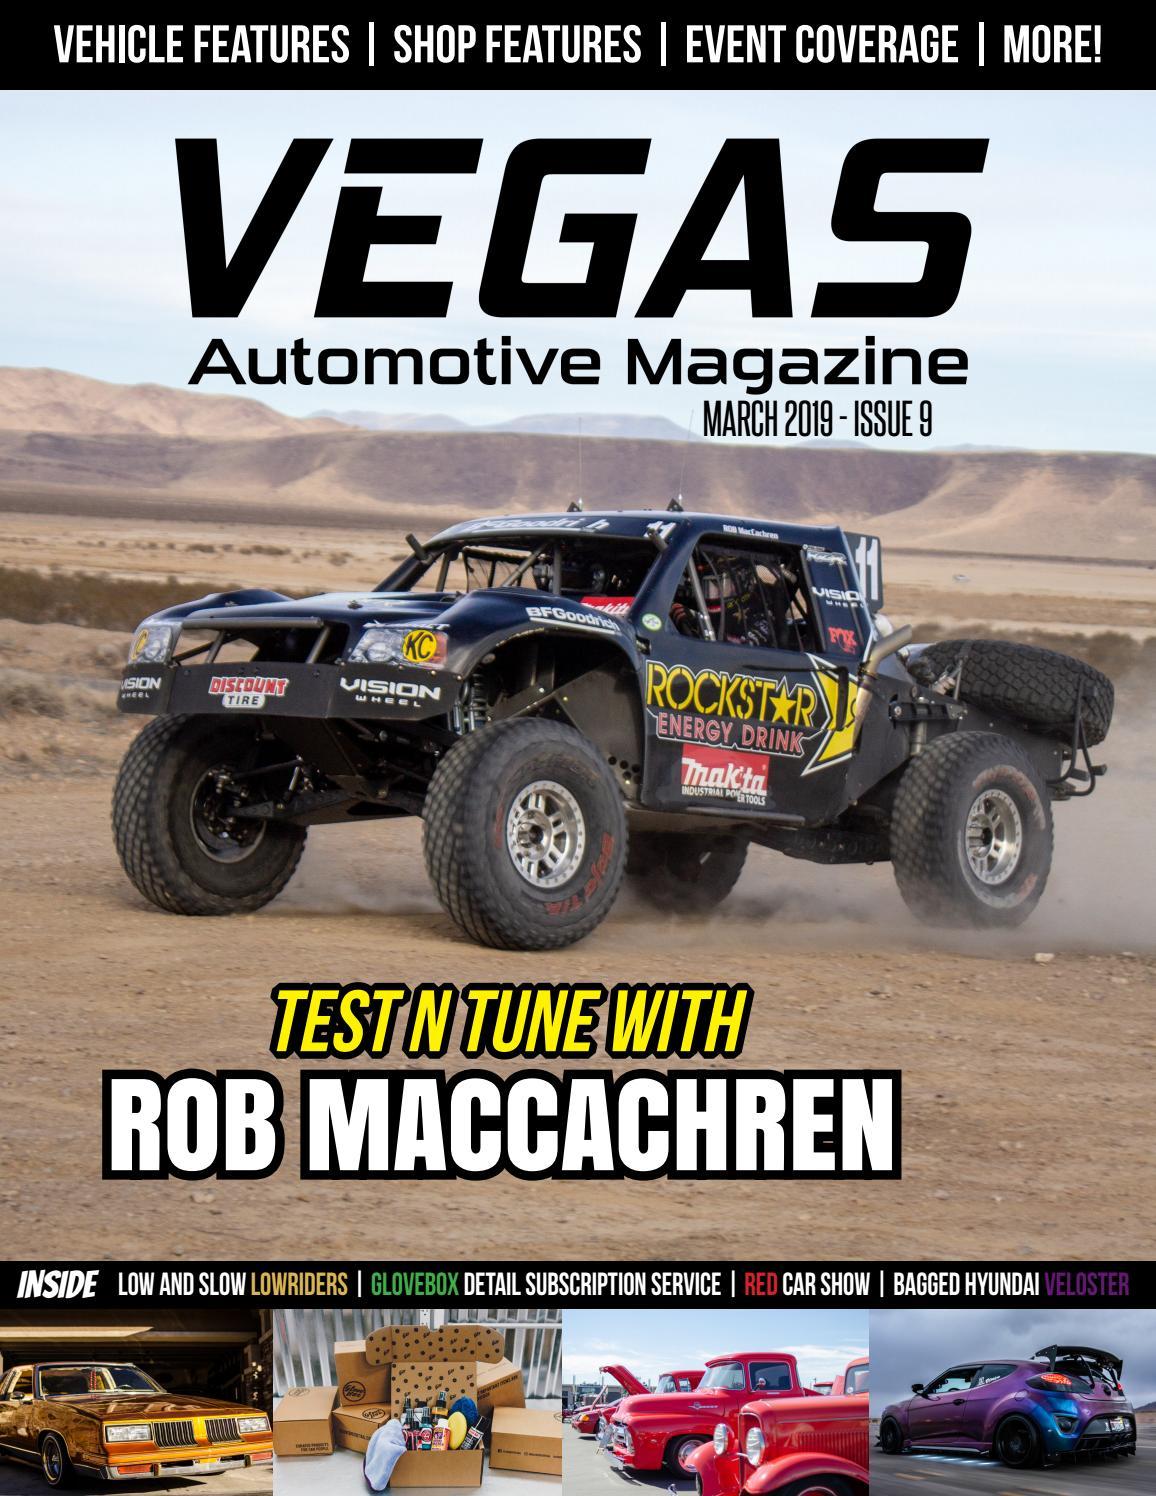 Vegas Automotive Magazine Issue 9: March 2019